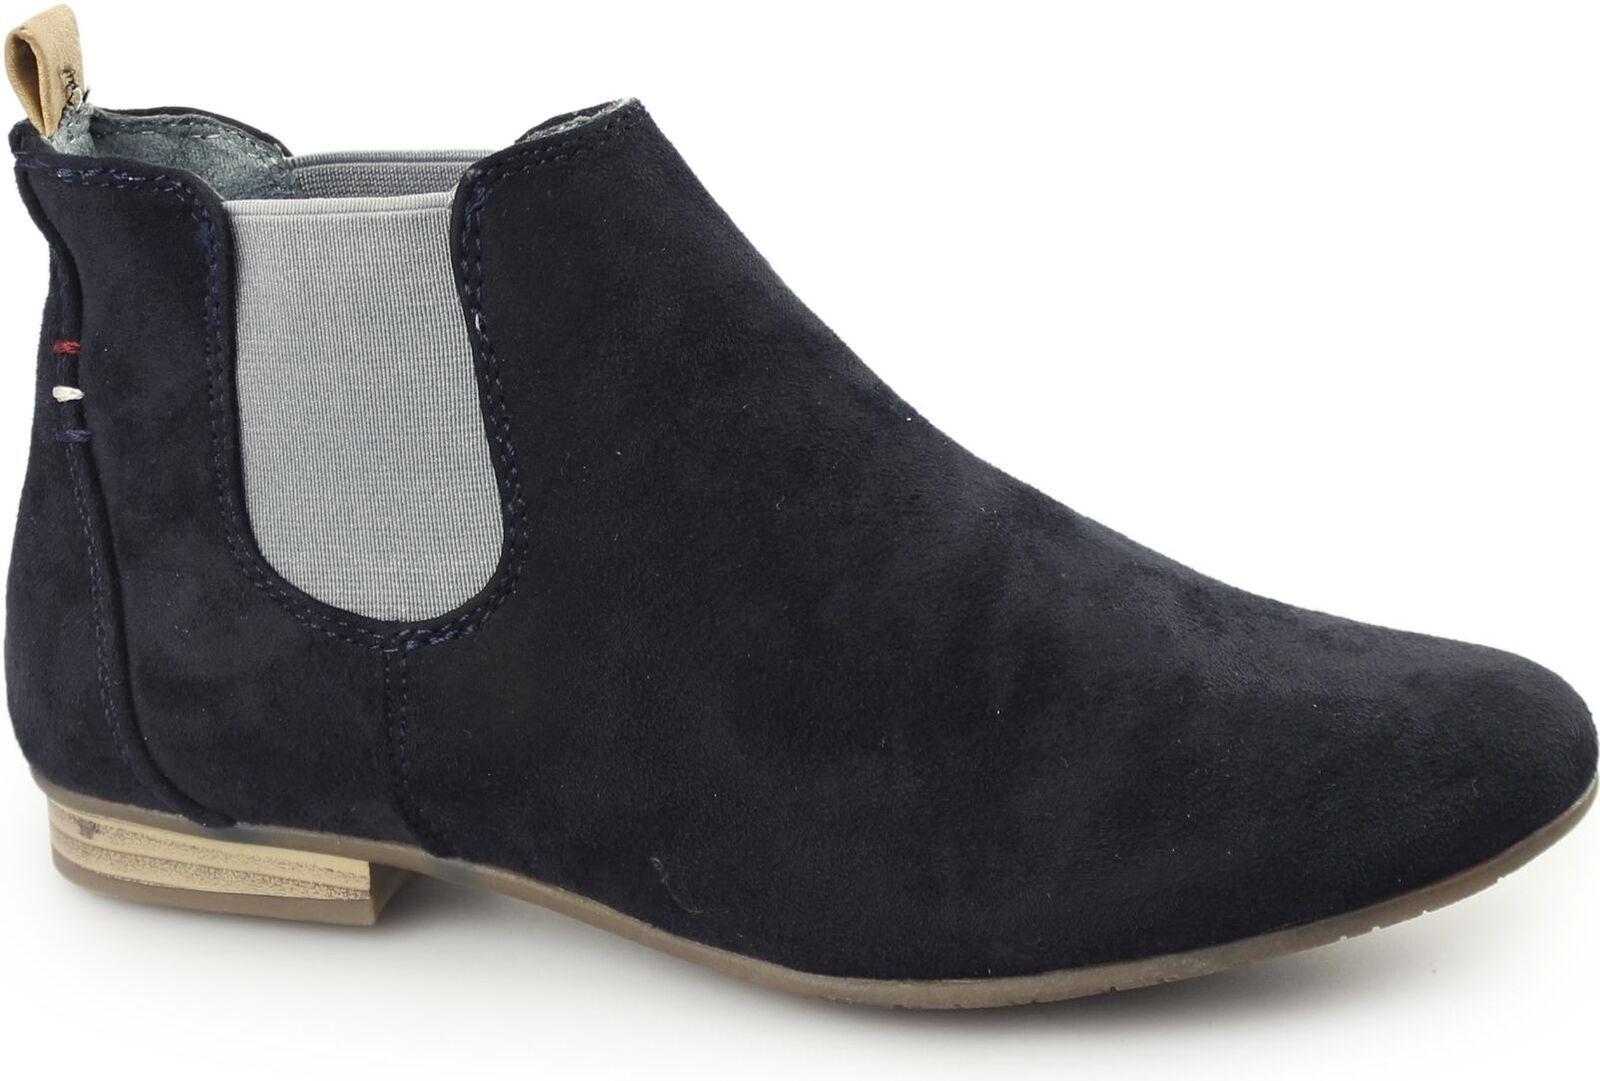 Divaz PISA Ladies Womens Soft Faux Suede Comfy Chelsea Ankle Boots Navy bluee